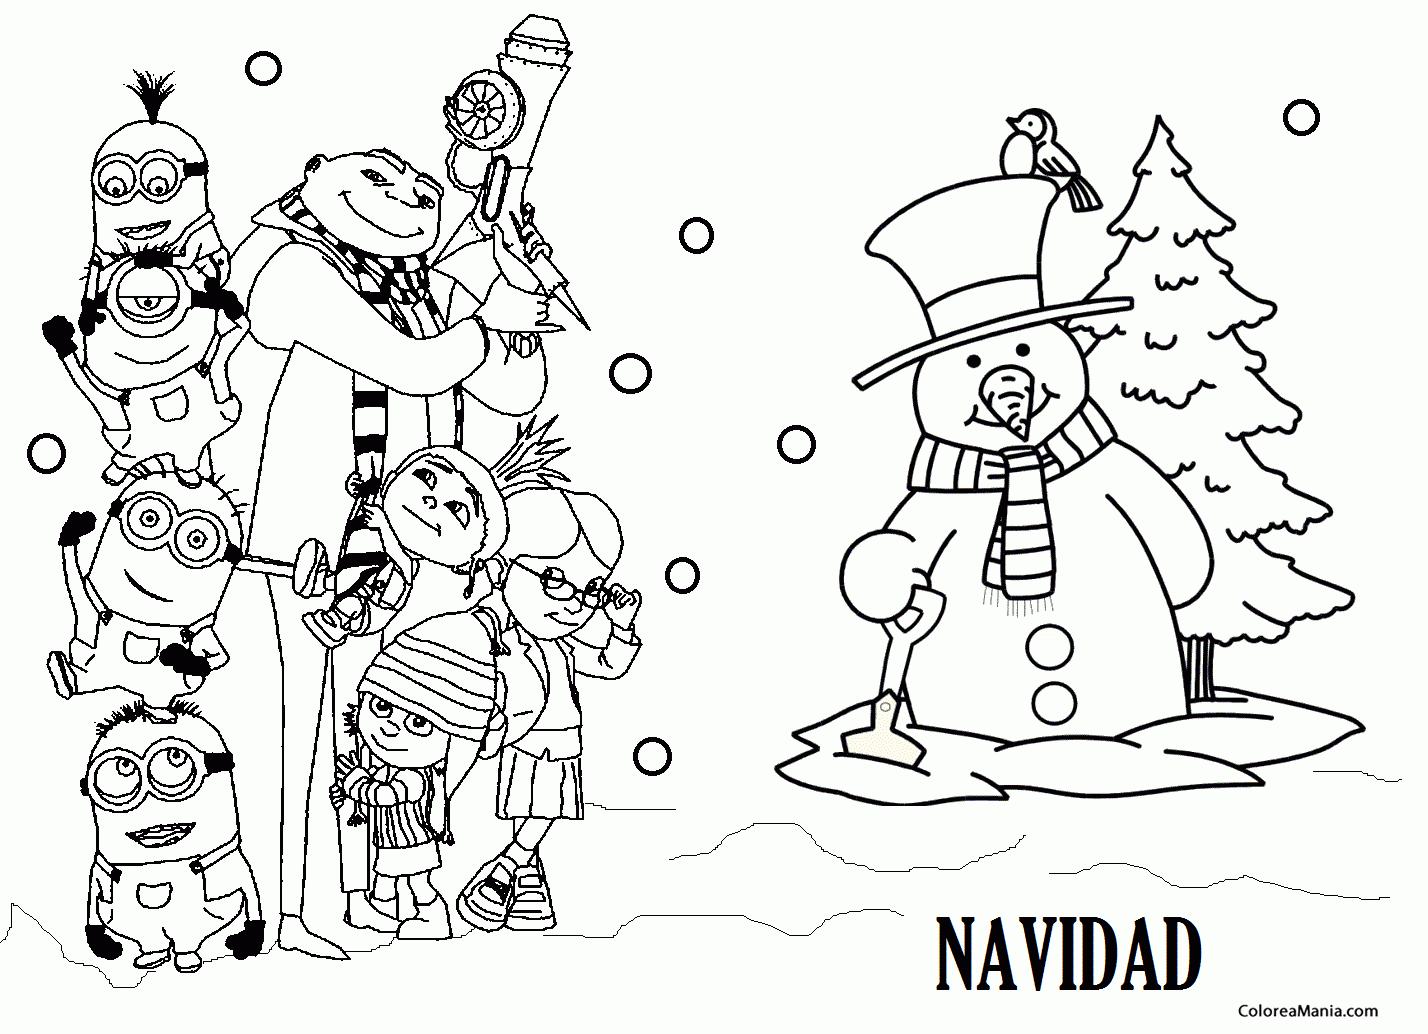 Colorear minions en navidad minions dibujo para colorear gratis - Dibujos de navidad para colorear gratis ...